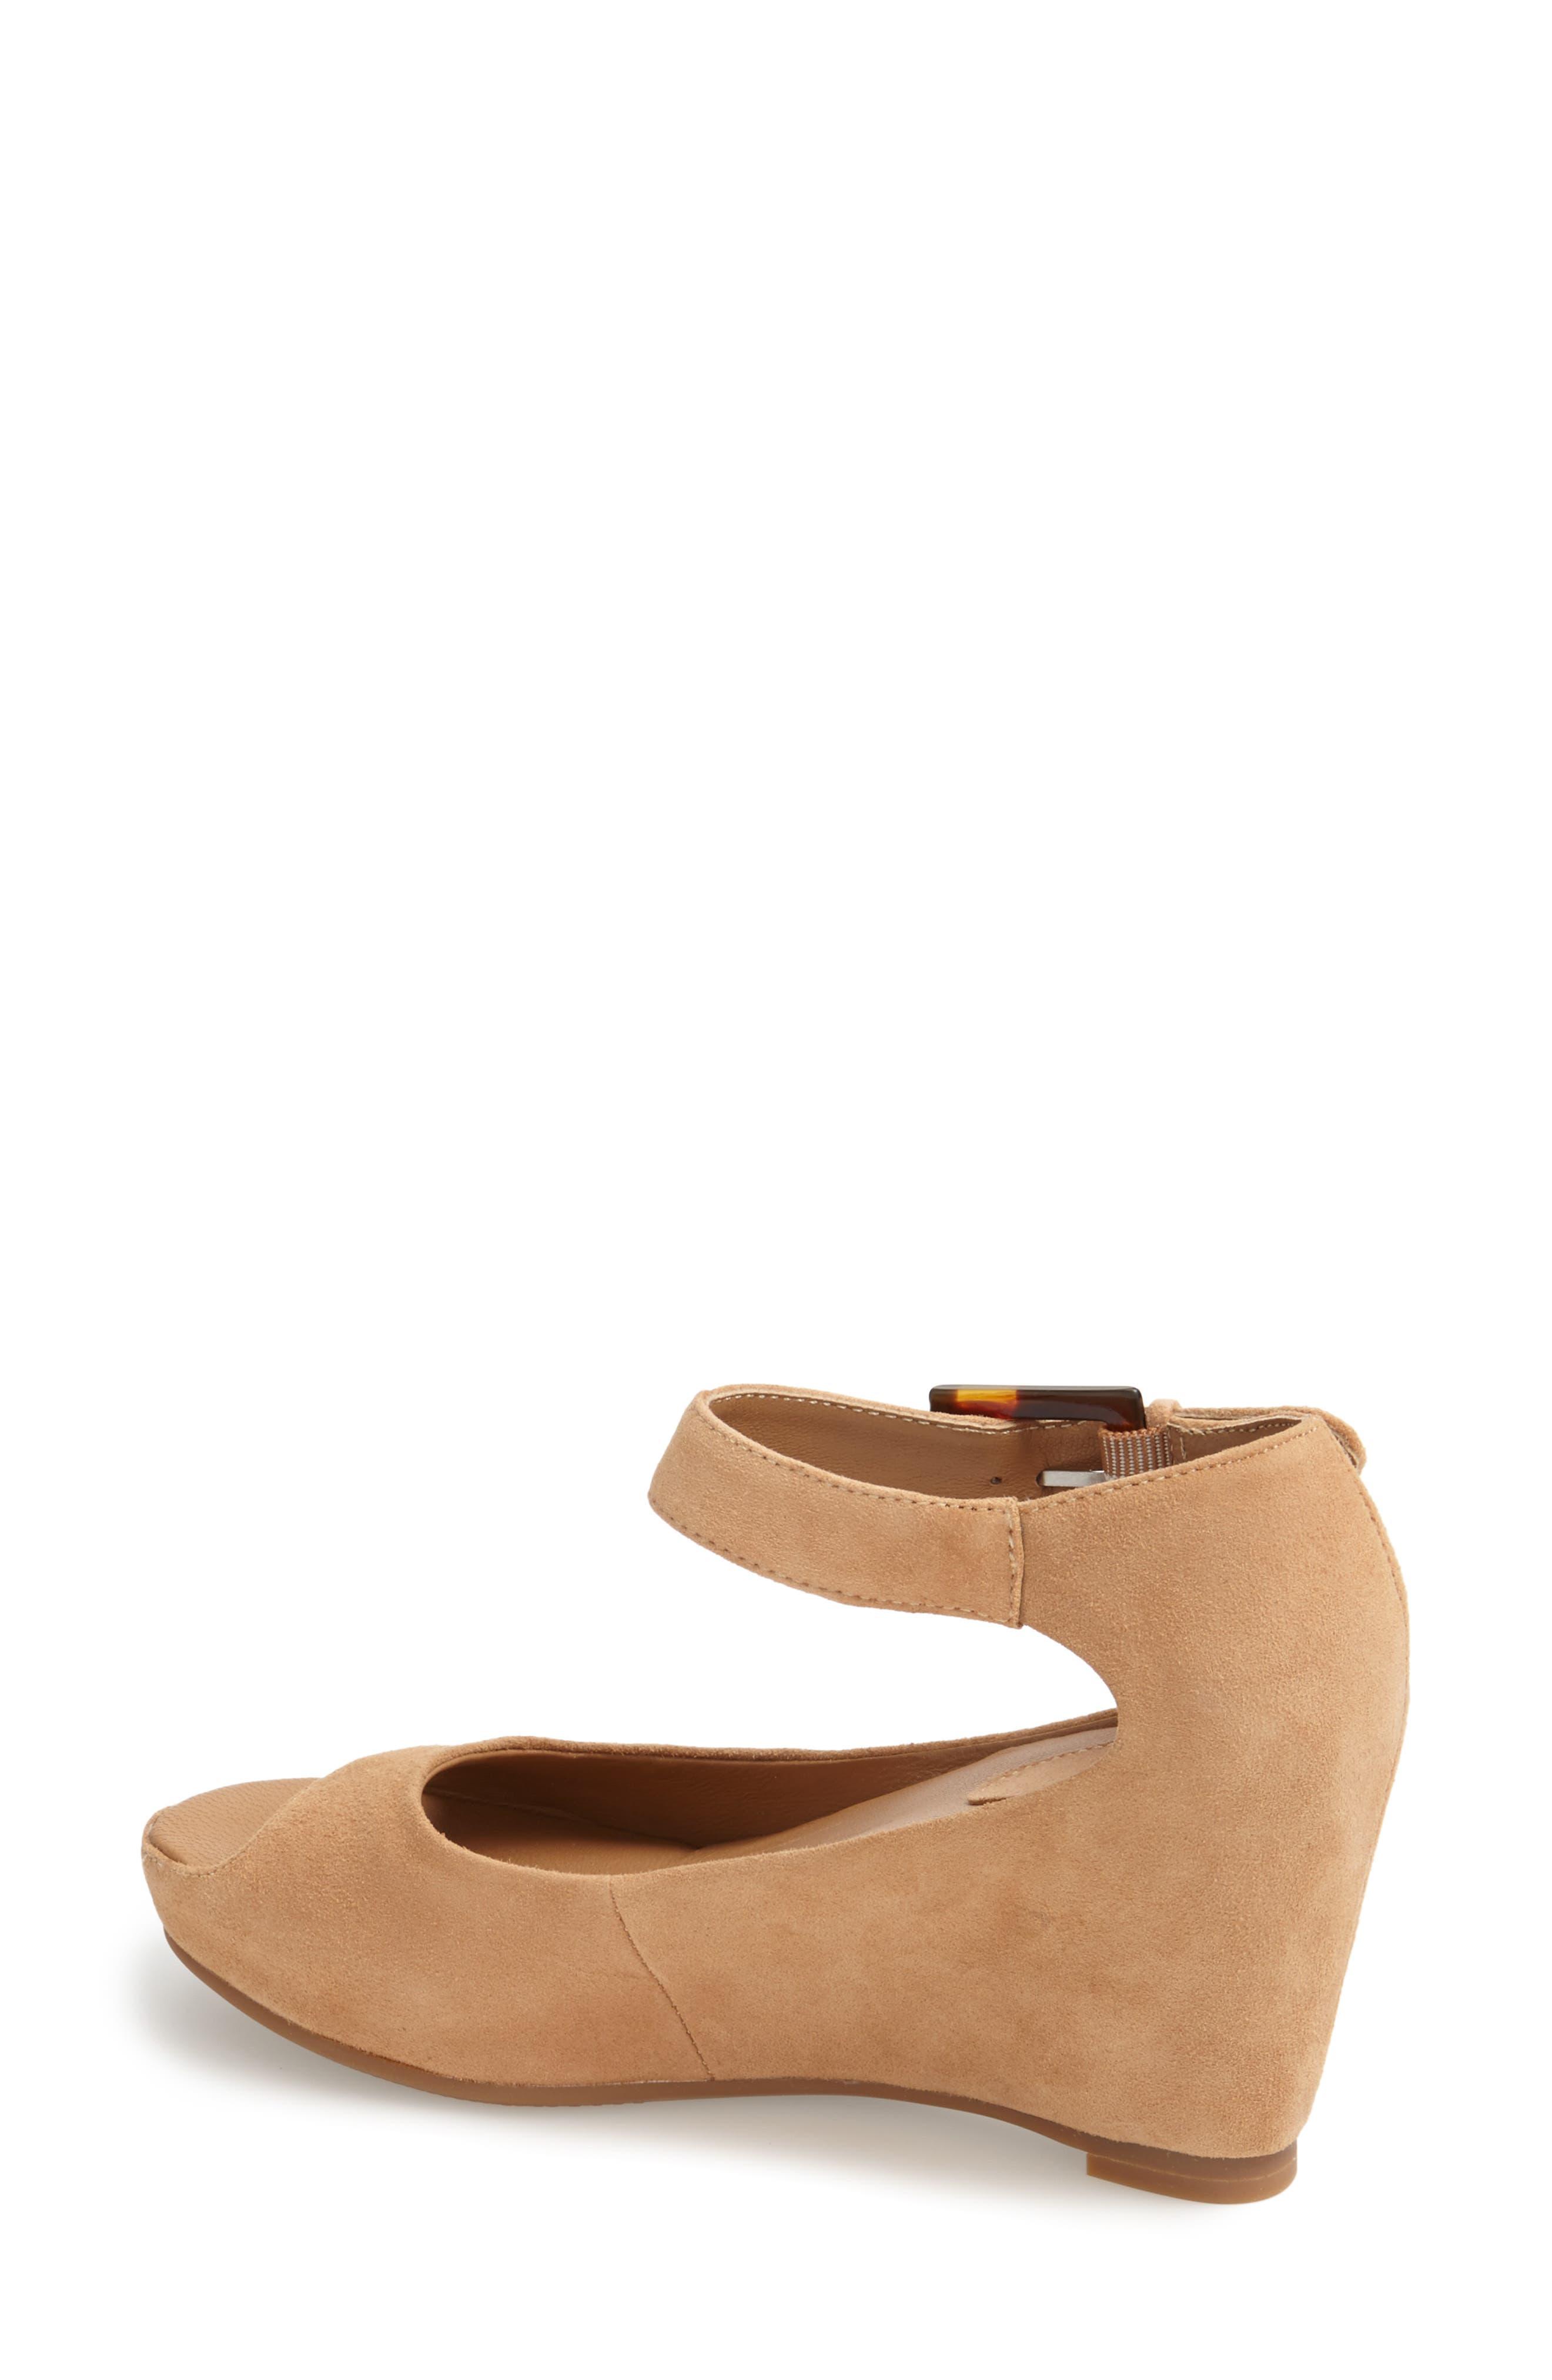 'Tricia' Ankle Strap Sandal,                             Alternate thumbnail 36, color,